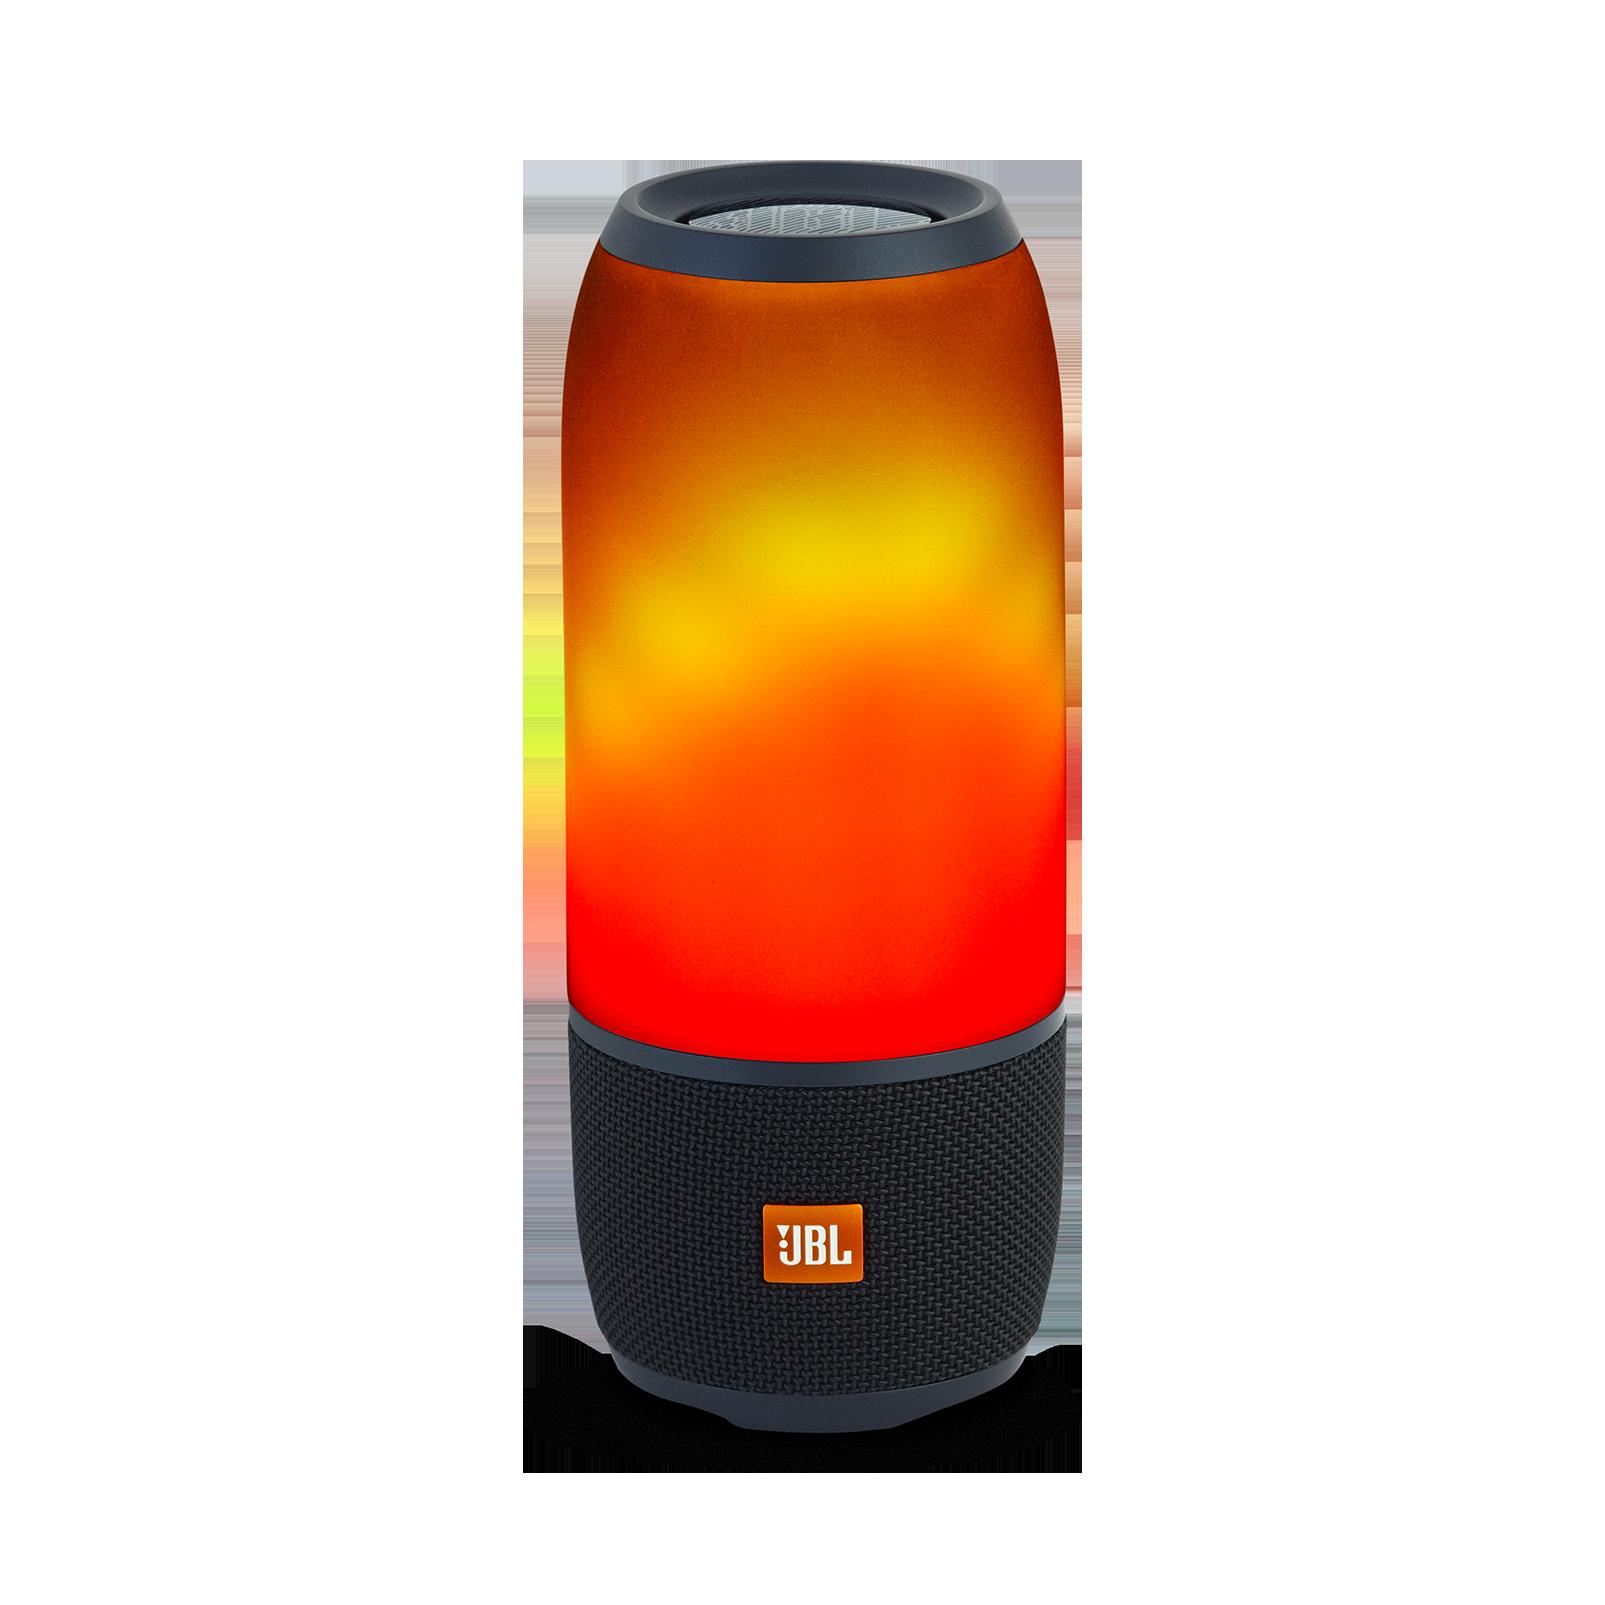 Pulse 3 - Black - Waterproof portable Bluetooth speaker with 360° lightshow and sound. - Detailshot 1